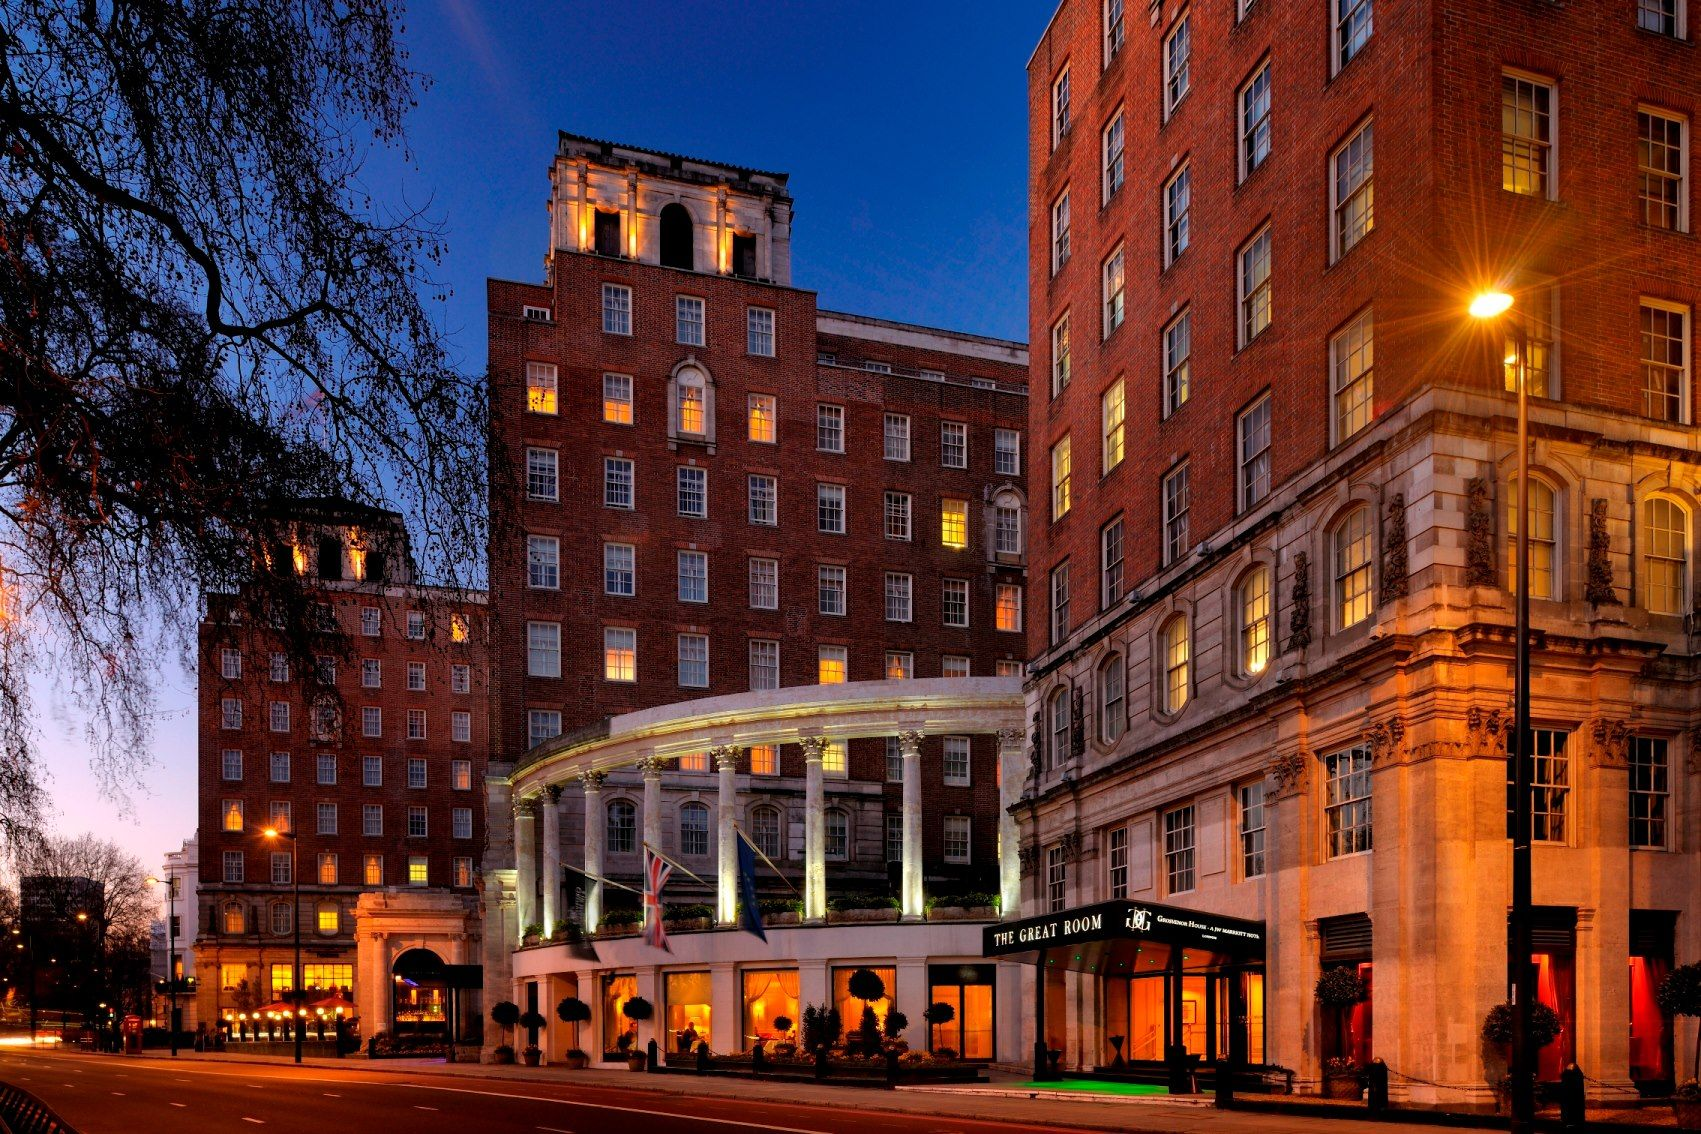 Grosvenor House London Was Originally Opened As An Art Deco Ice Skating Rink London Hotels Grosvenor House Marriott Hotels